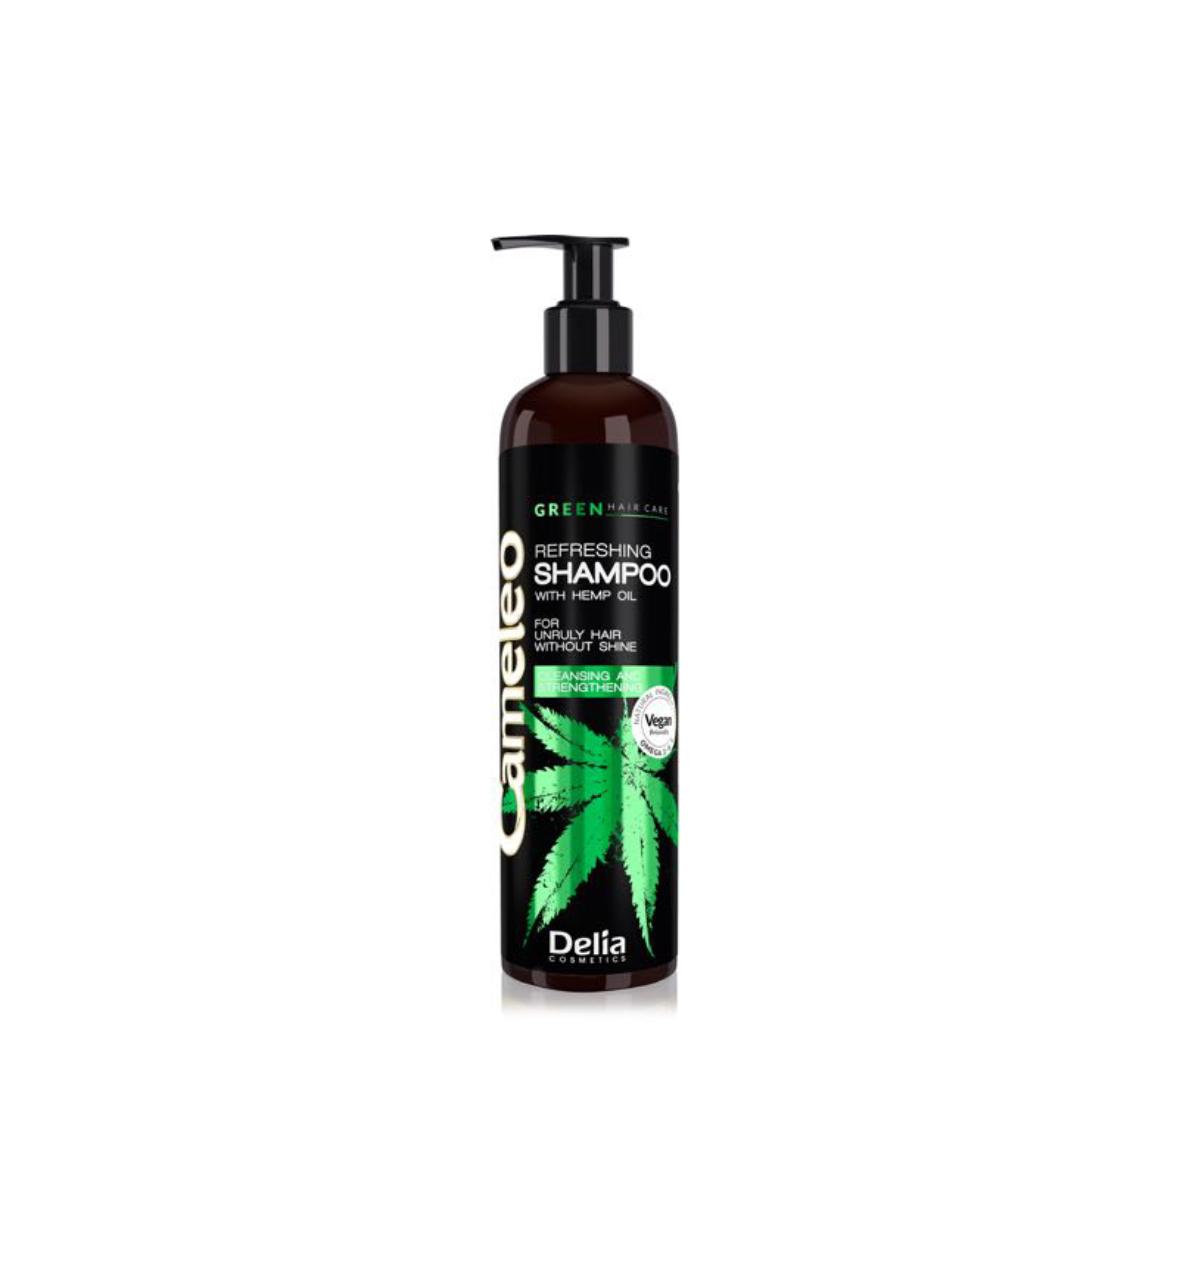 Delia Cameleo - VEGAN GREEN WITH HEMP OIL - Shampoo